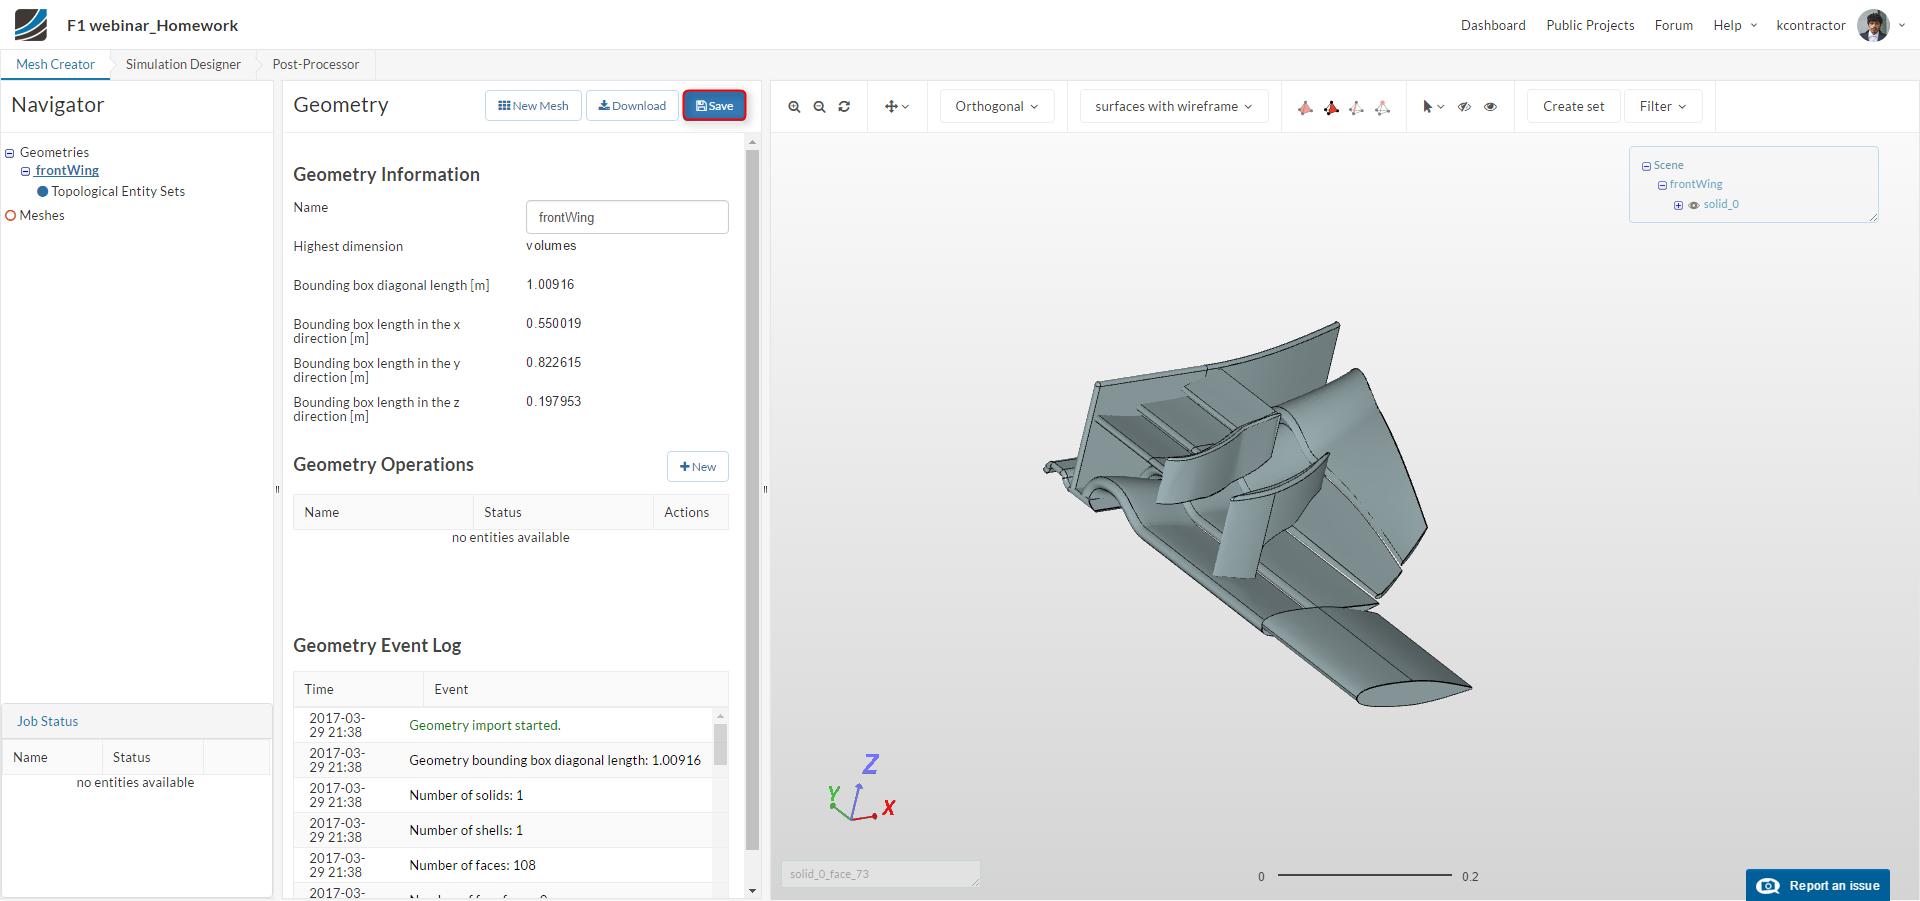 f1 aerodynamics, front wing geometry upload